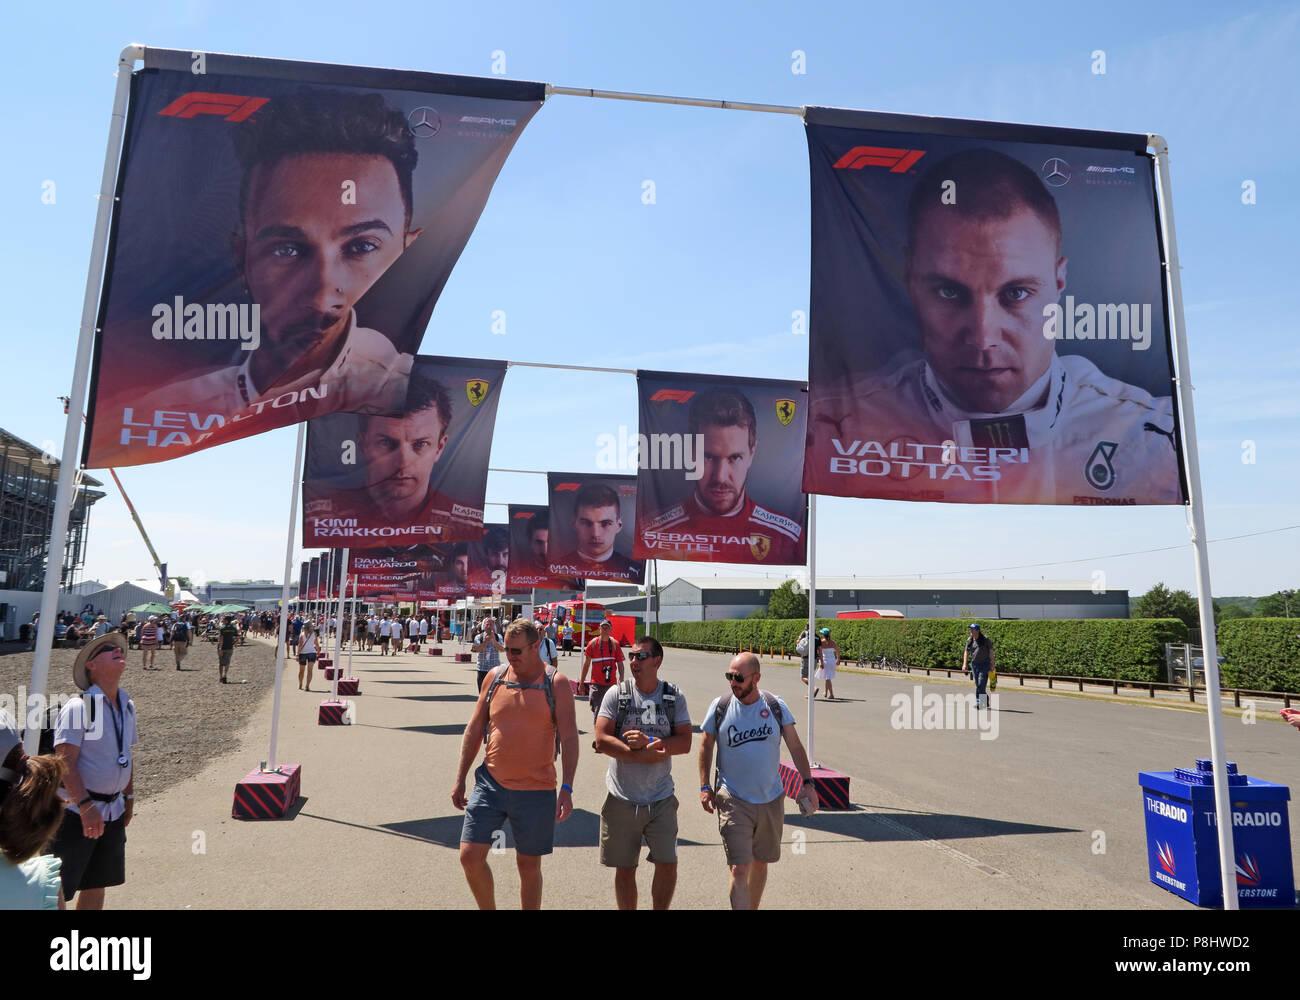 @HotpixUK,GoTonySmith,Silverstone,British Grand Prix 2018,car,track,people,spectators,spectator,the circuit,circuit,F1,F1 Circuit,British,British Formula 1 Championship,British Grand Prix,Formula One driver flags,Formula 1,driver,flag,formula1,driver portraits,Northampton,England,UK,racing,Lewis,image on flags,Silverstone circuit,Silverstone Circuit,British GP 2018,Formula One,drivers